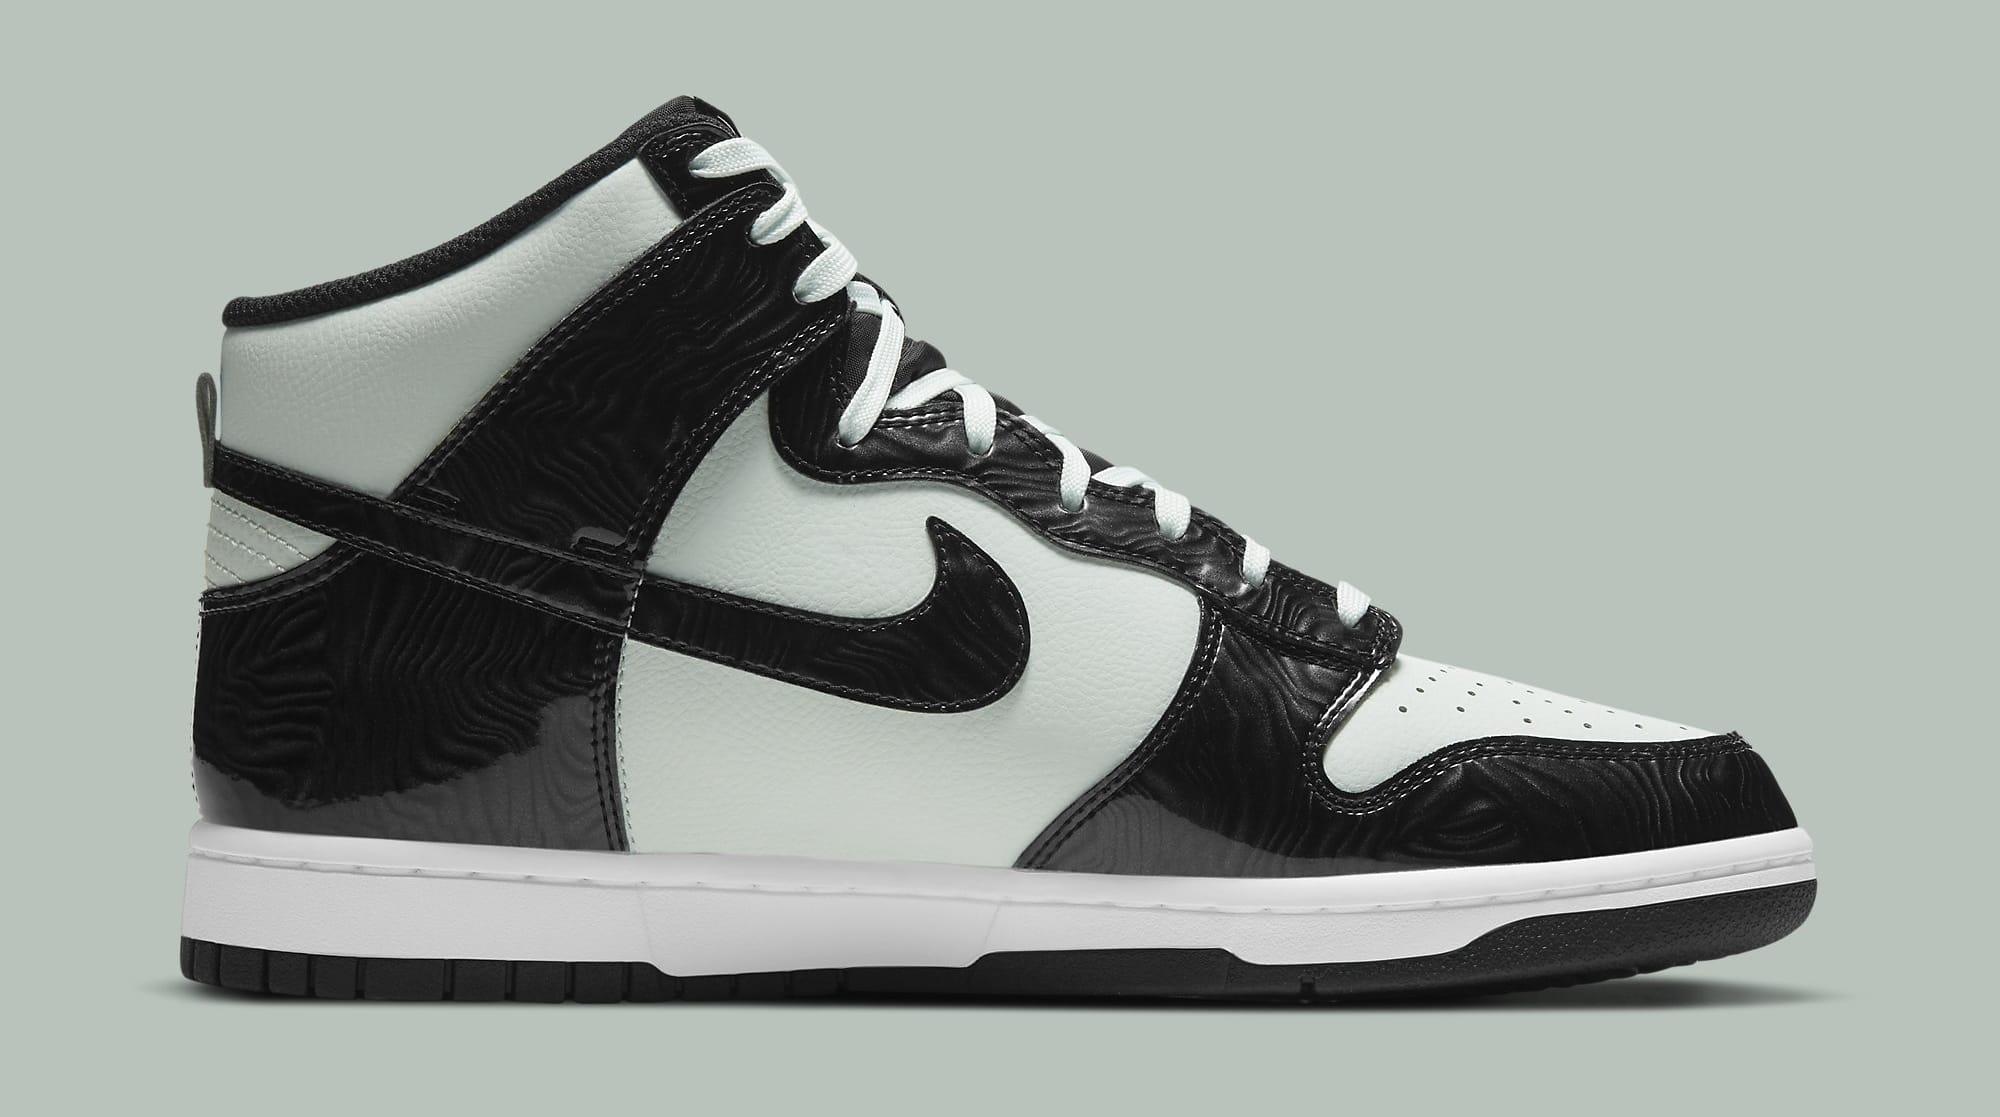 Nike Dunk High 'Barely Green' DD1398-300 Medial